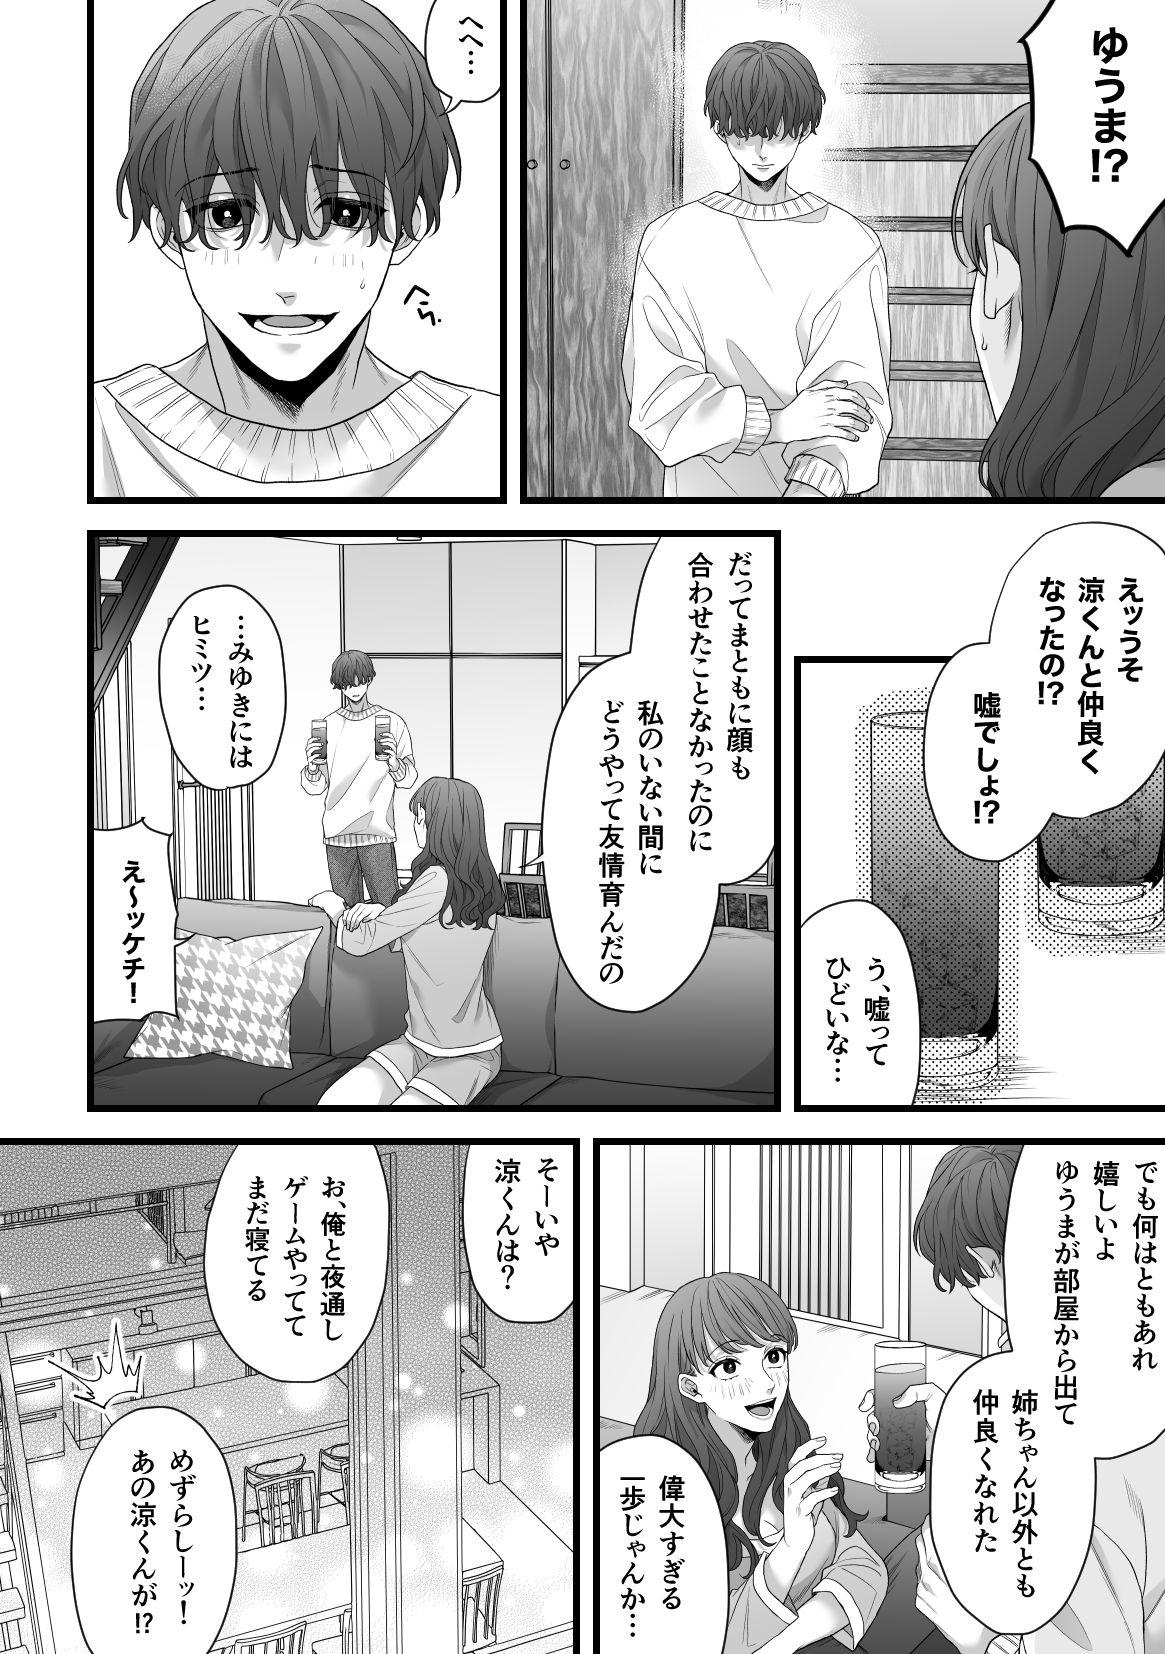 Gikei Ryoujoku 23